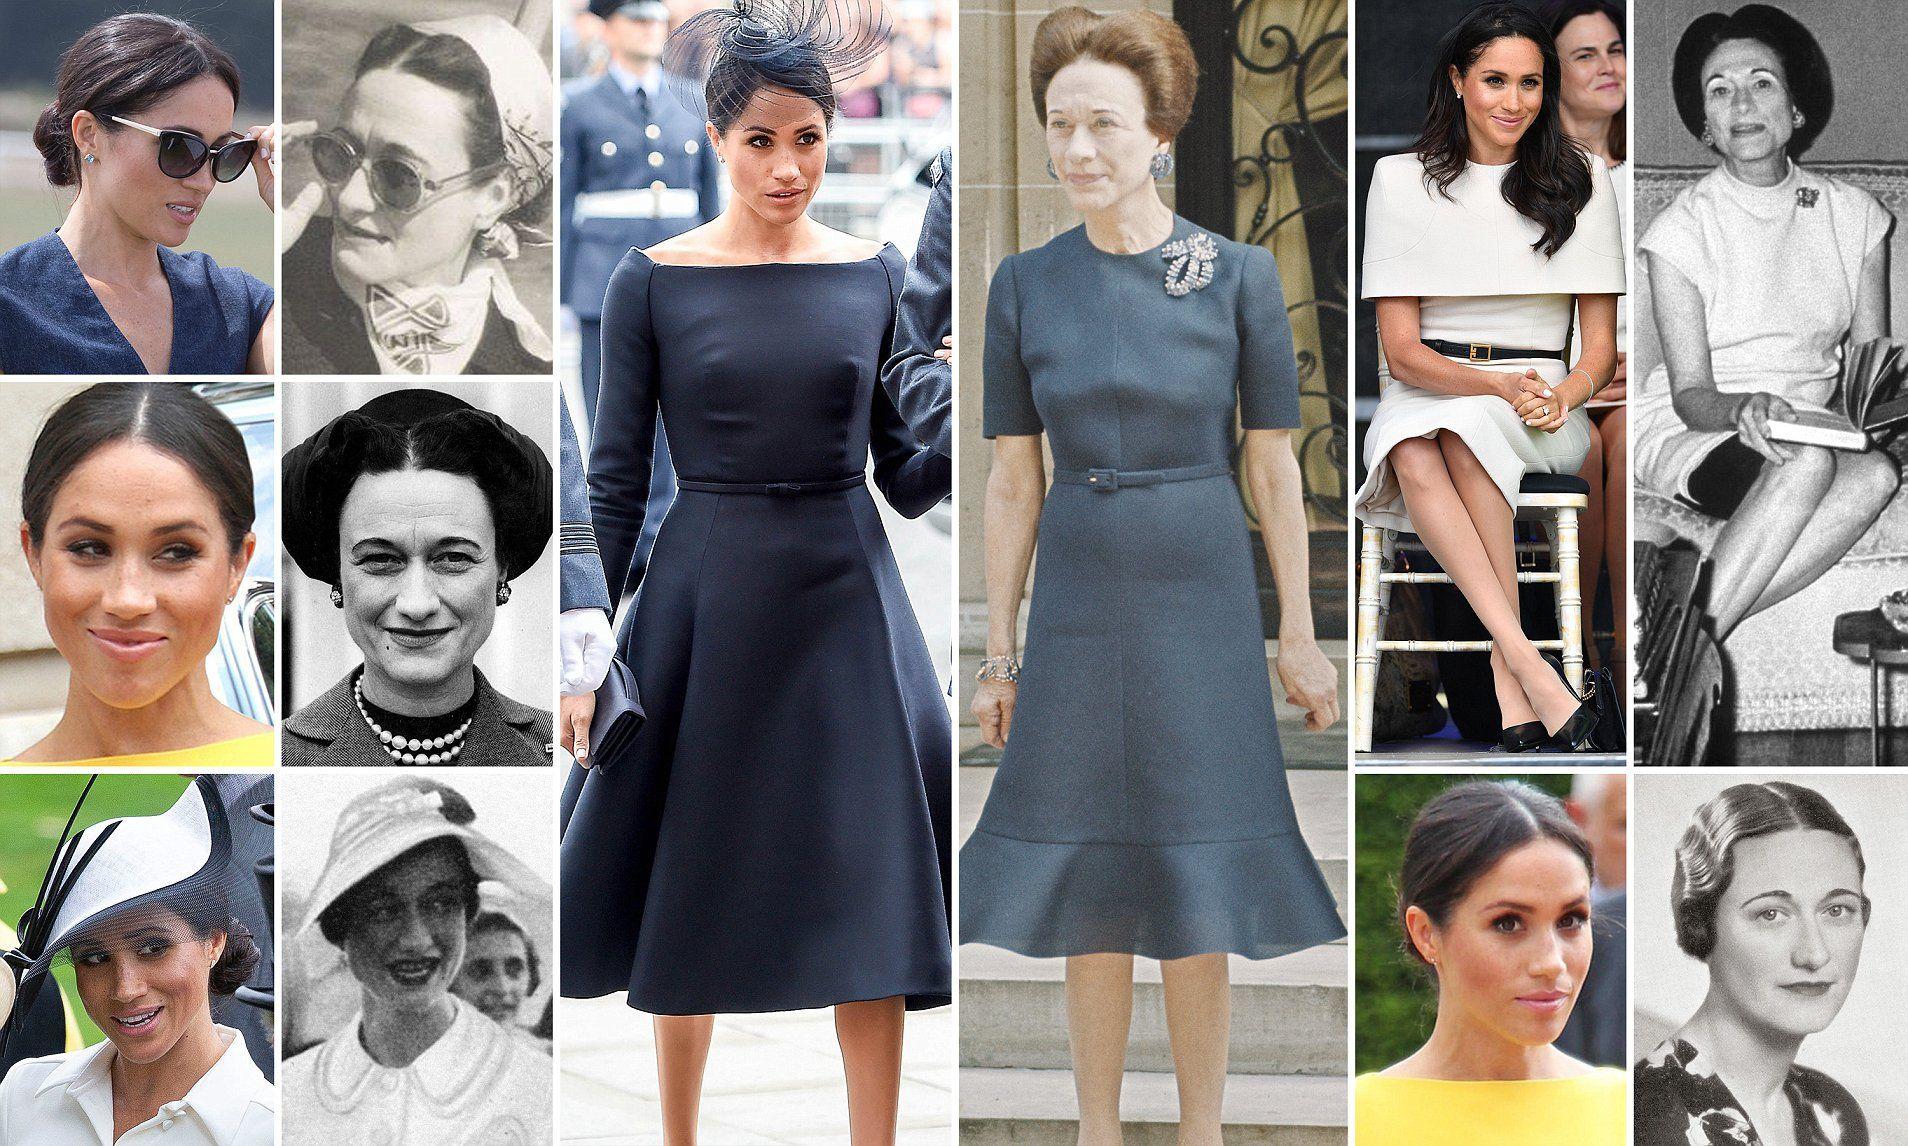 Wallis simpson wedding dress  Meghan Markle and Wallis Simpson divorced Americans who found prince